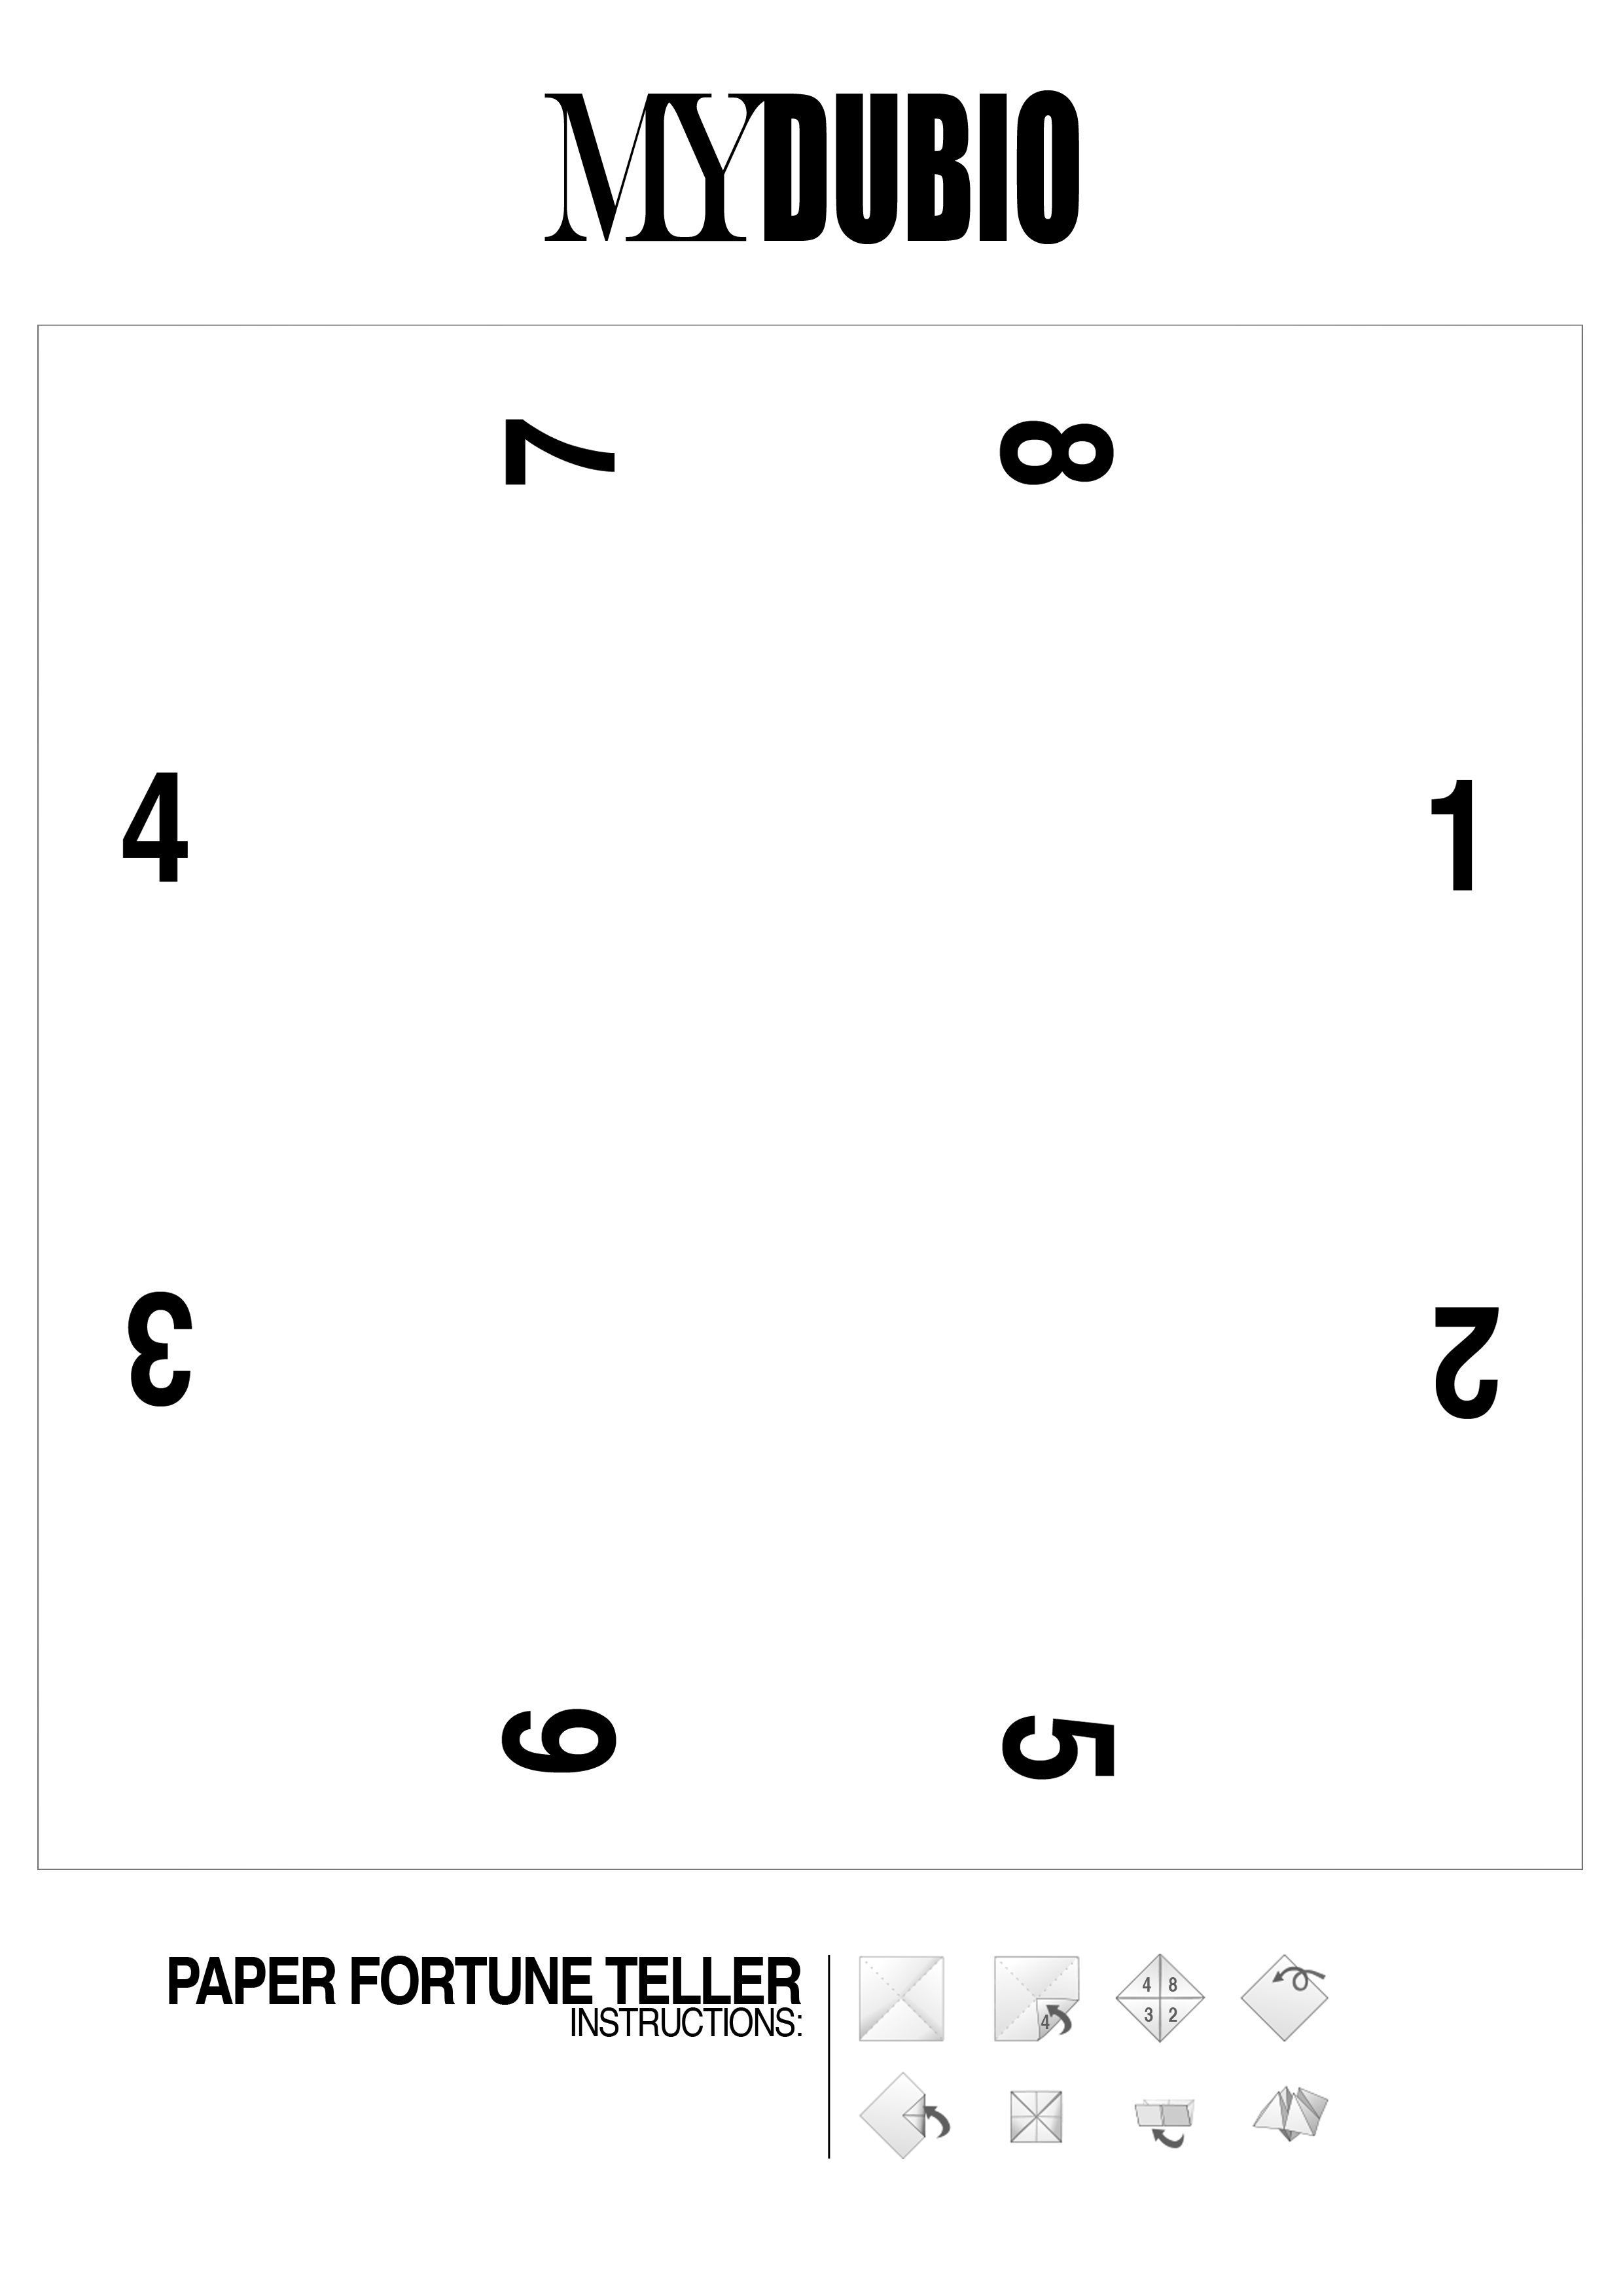 Minimal Paper Fortune Teller Mydubio 2 480 3 508 Pixels